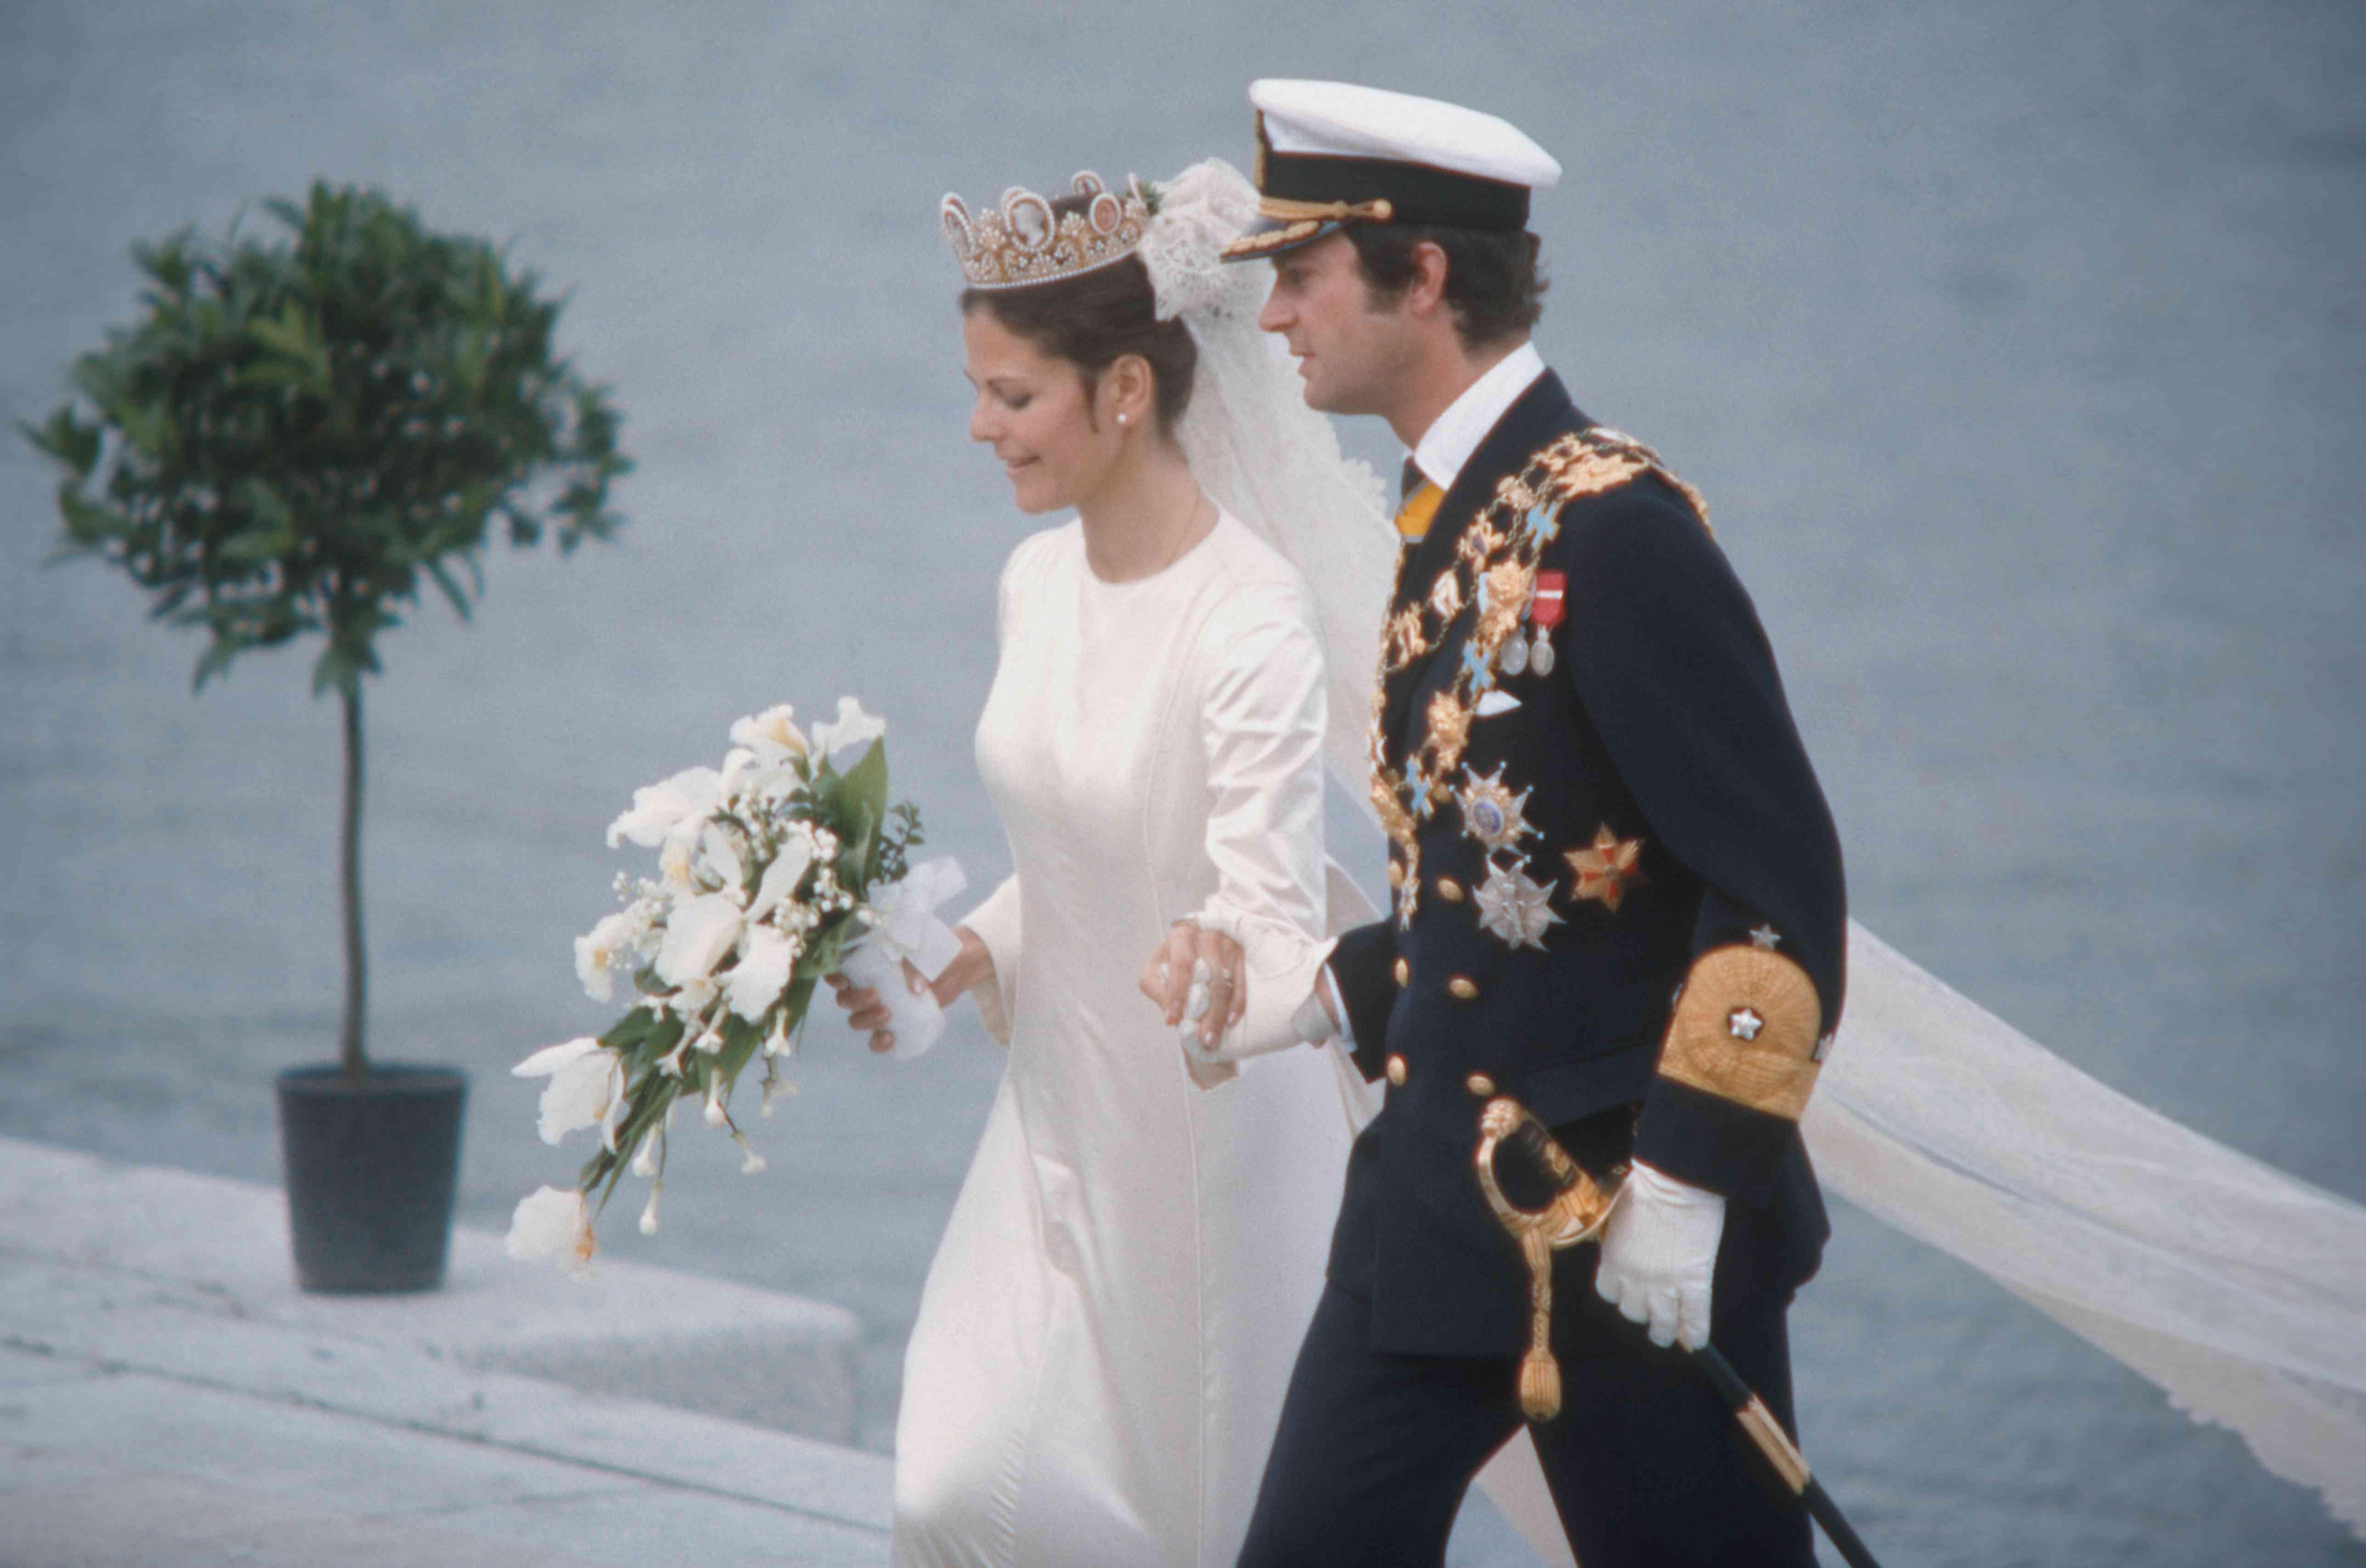 King Carl Gustaf XVI of Sweden and Silvia Sommerlath on their wedding day